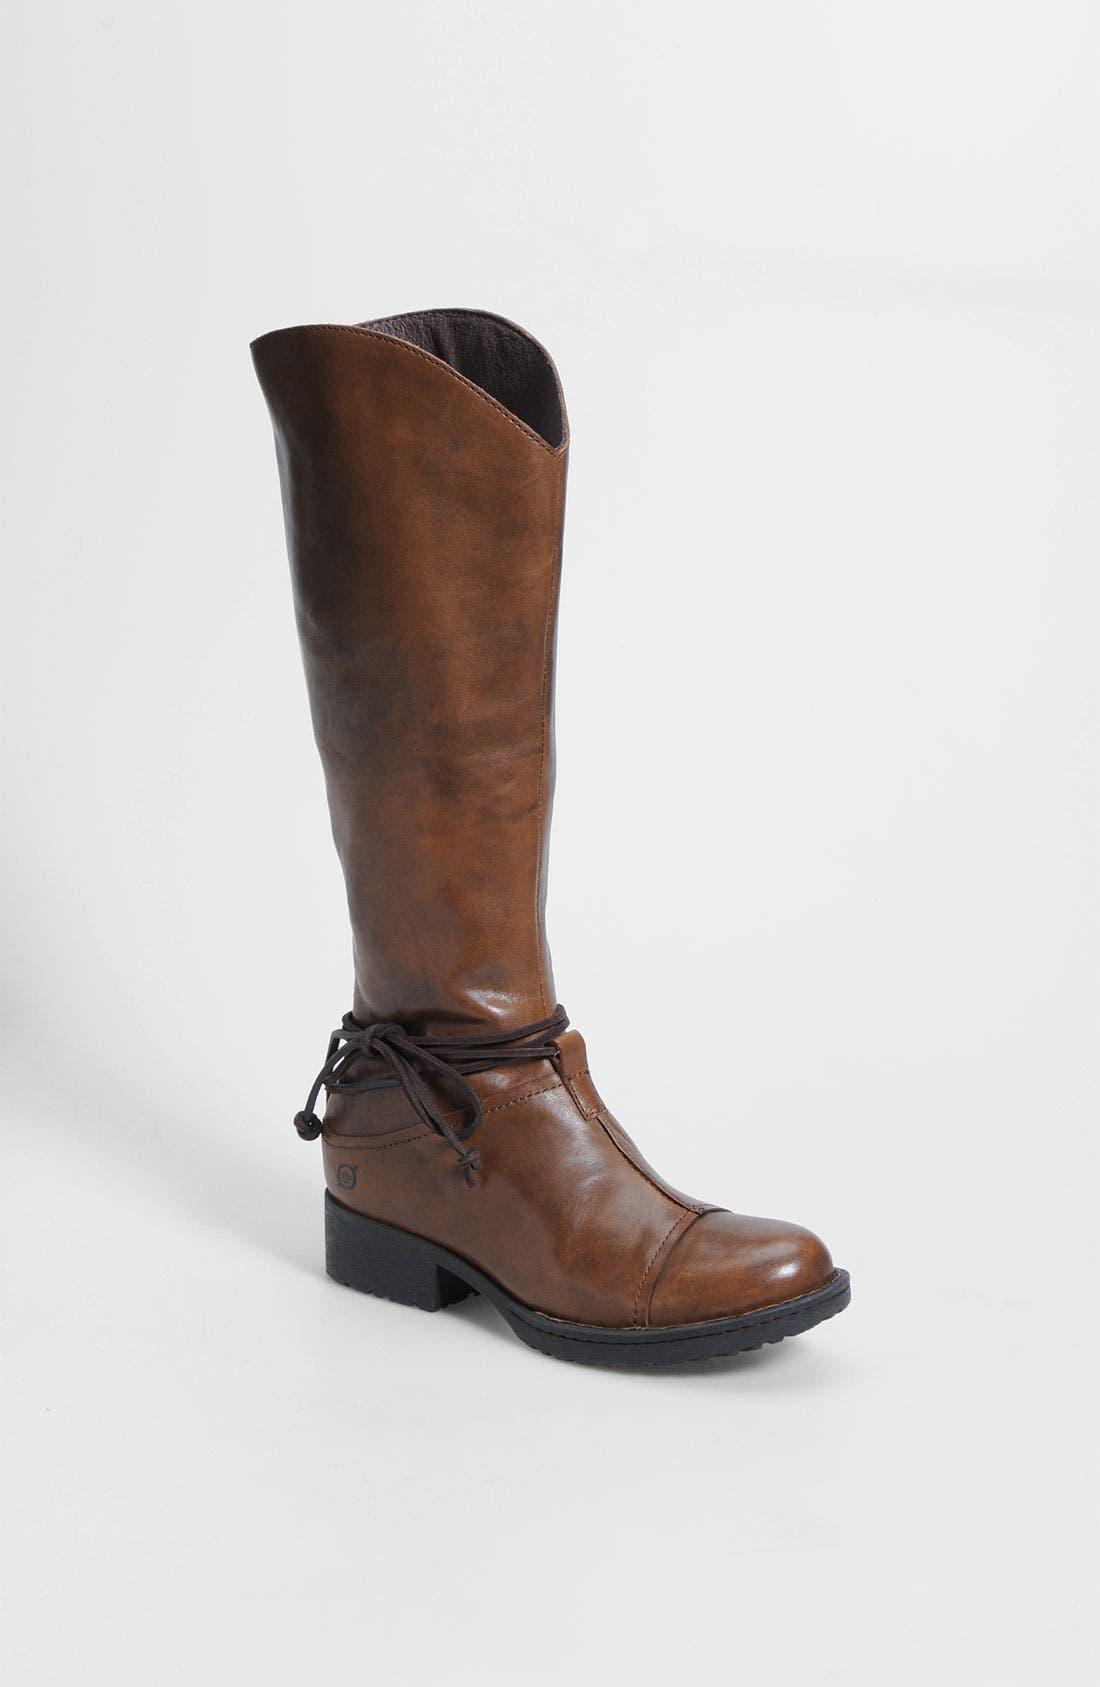 Alternate Image 1 Selected - Børn 'Shyra' Boot